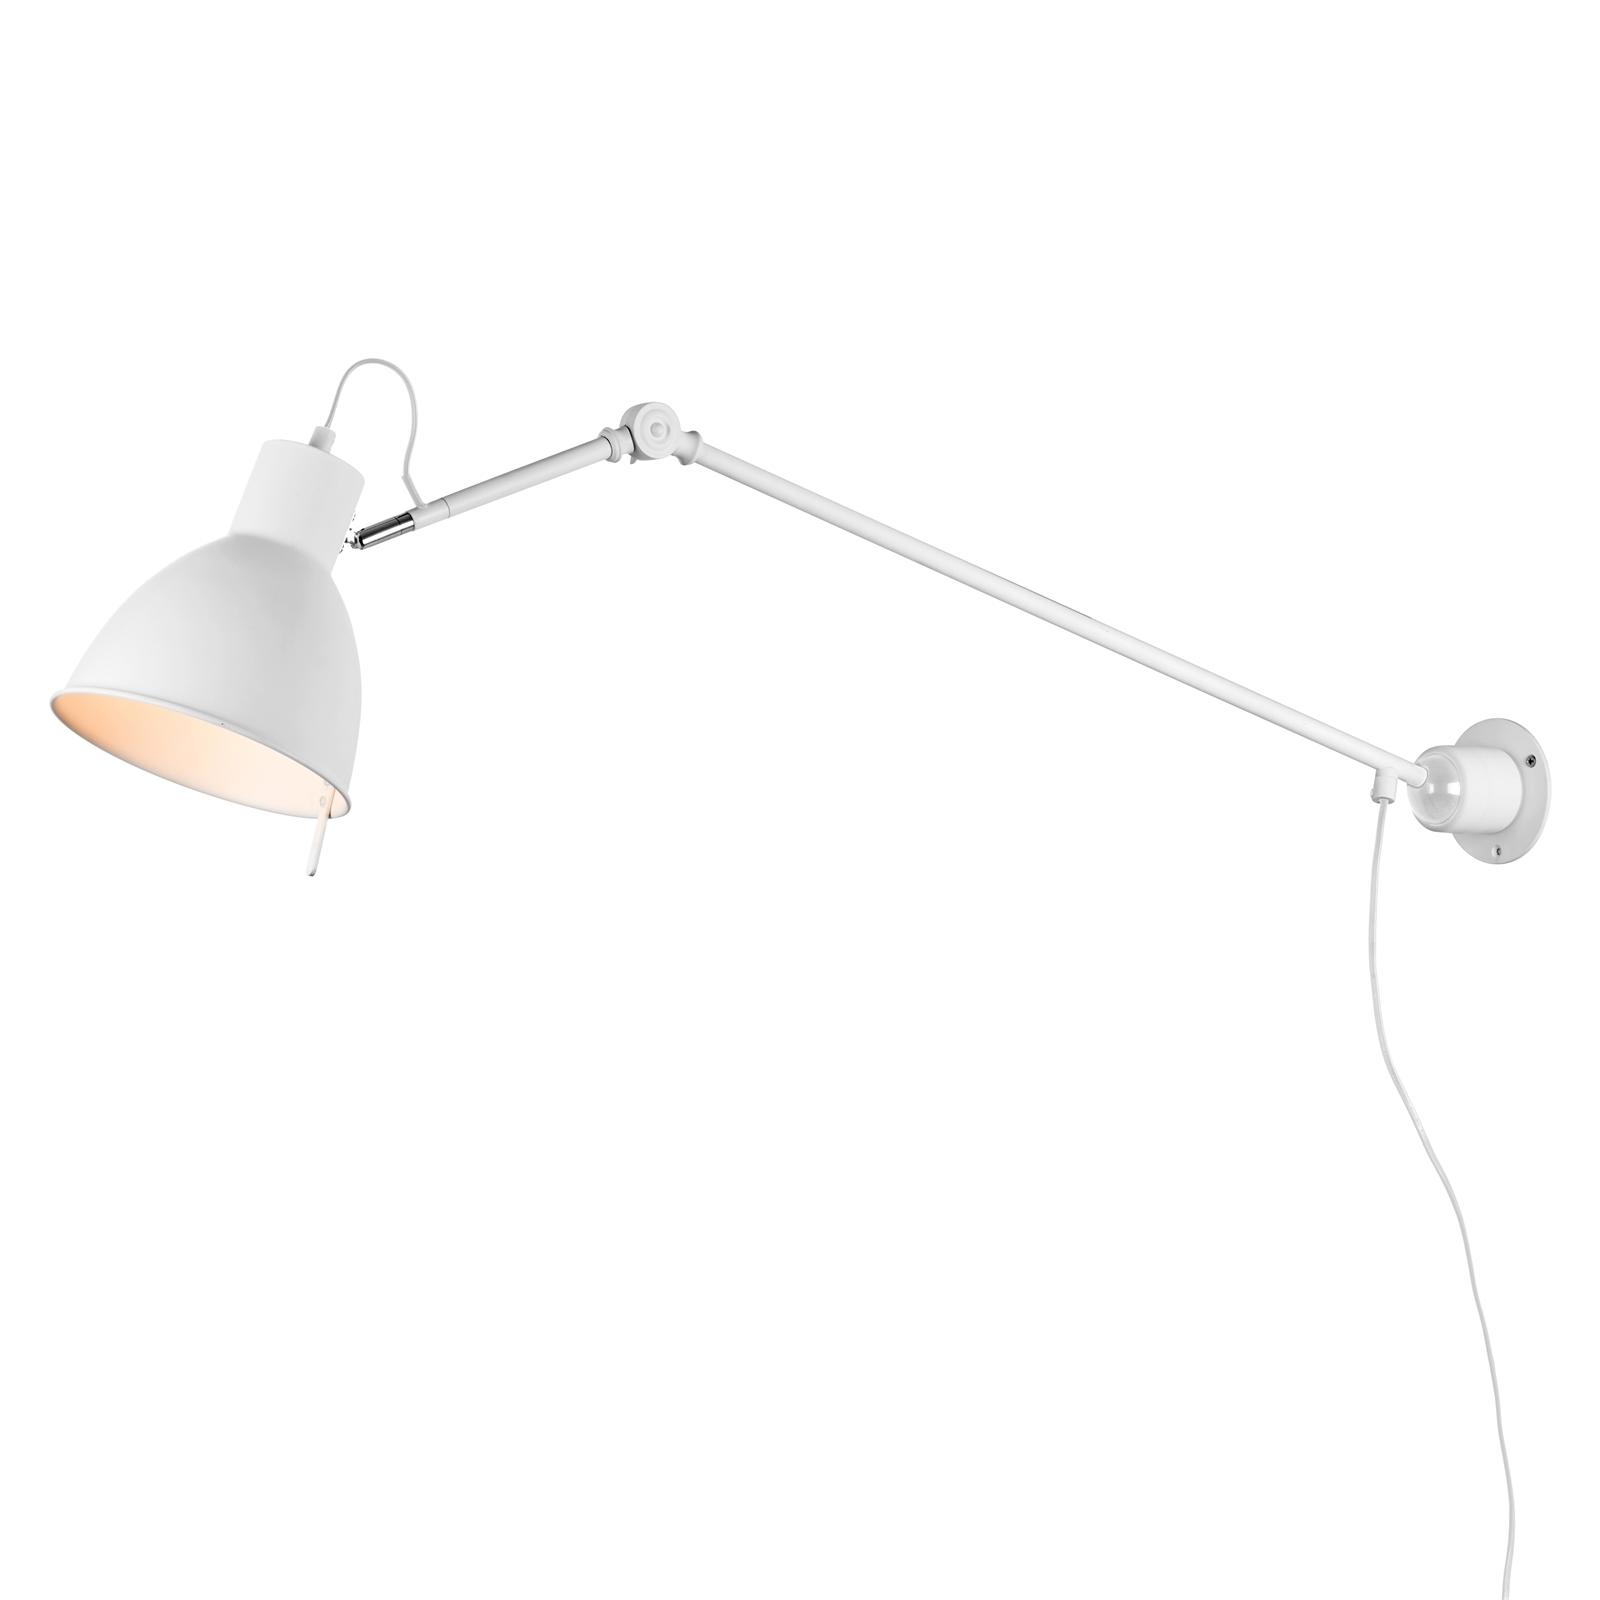 Verve Design White Harper DIY Wall Light With Long Arm